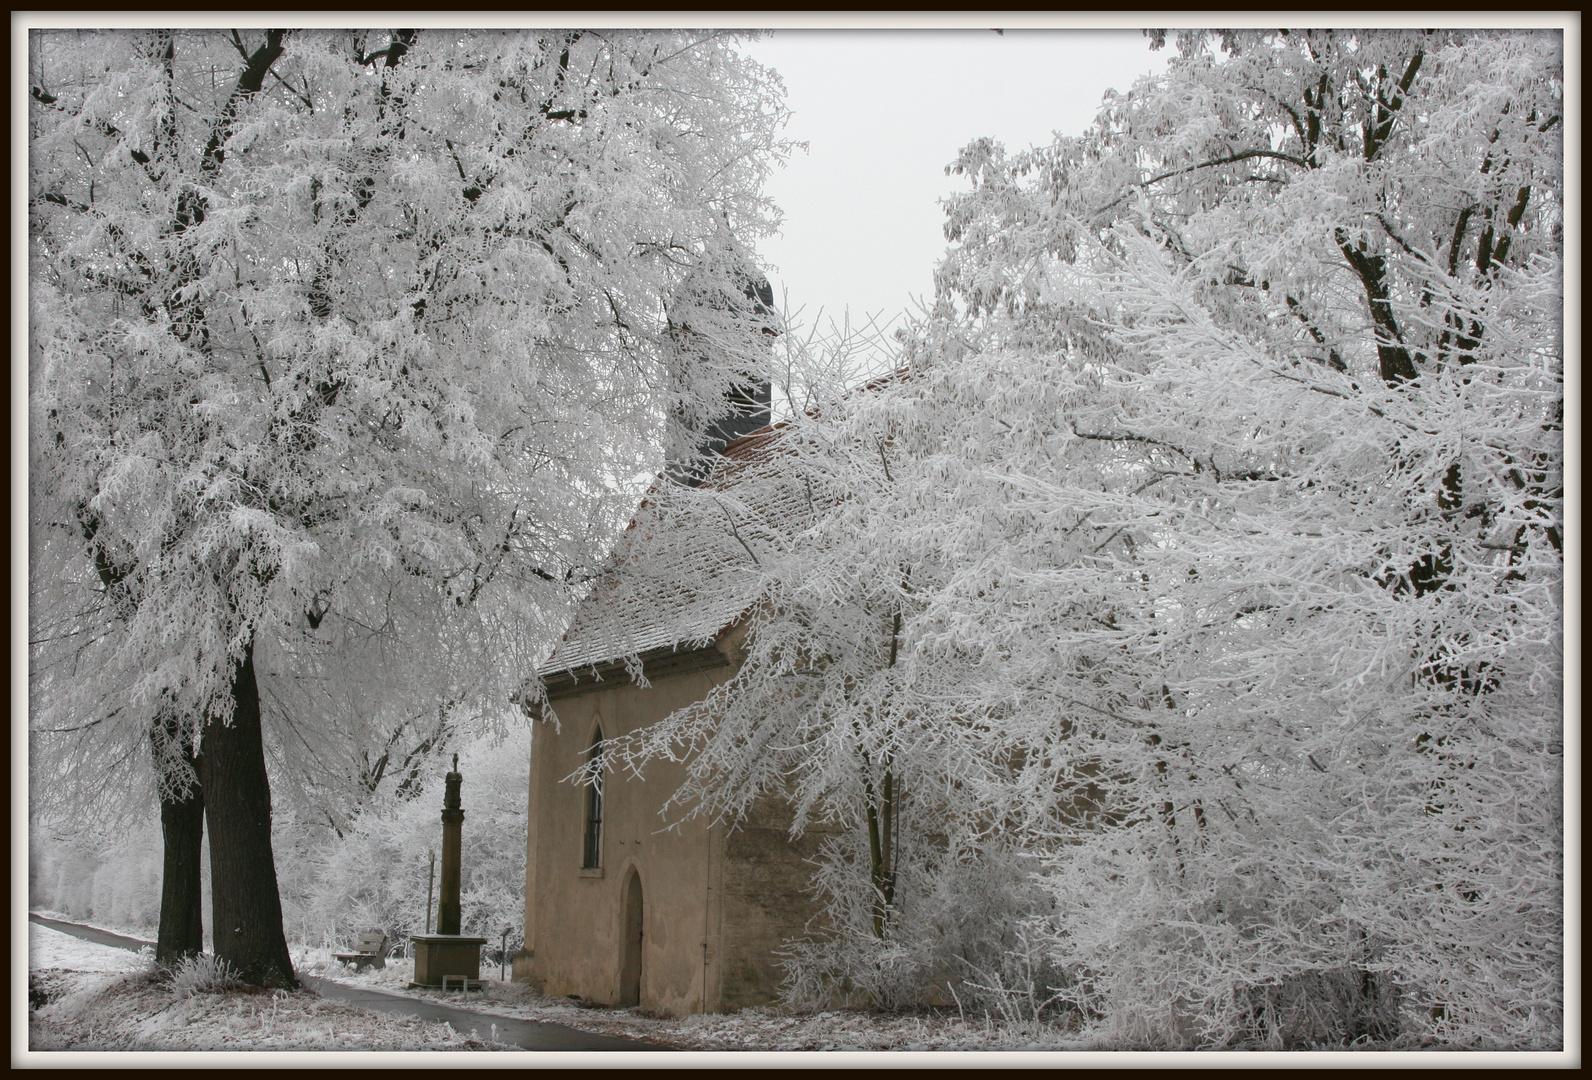 Kapelle bei Knetzgau